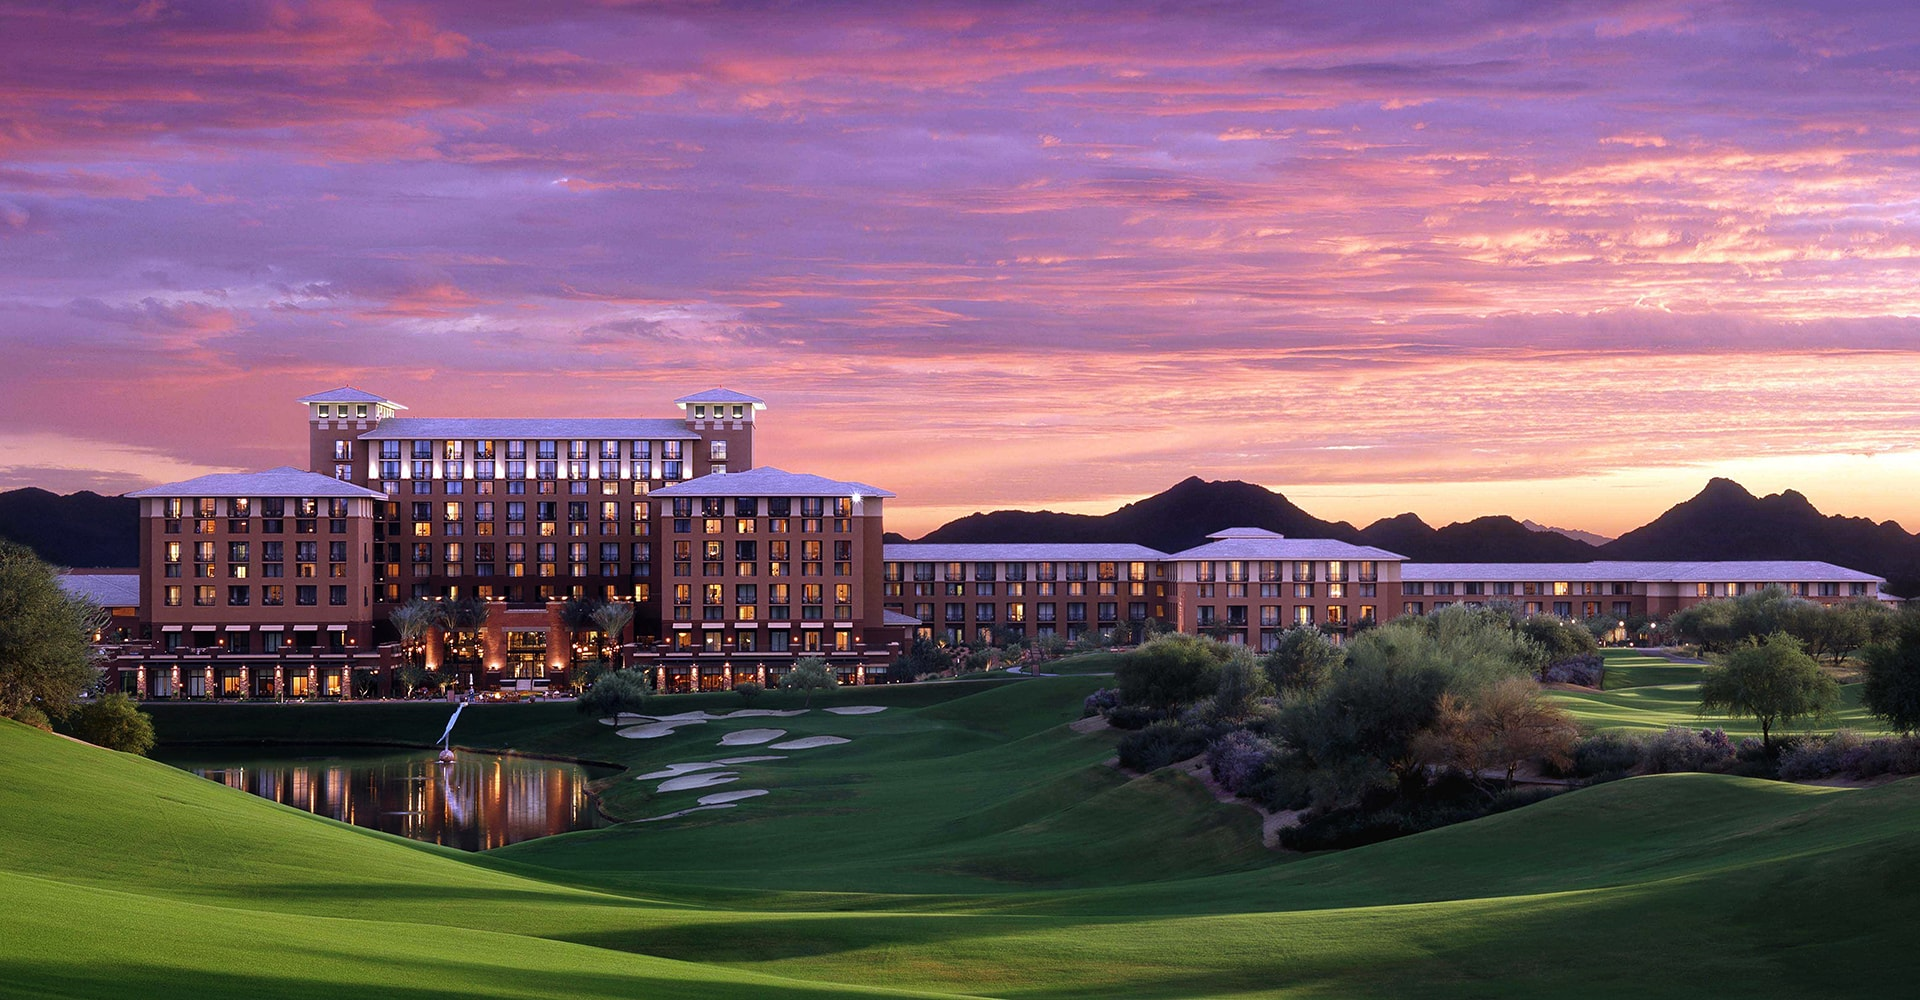 Kierland Westin Resort at Dusk In Scottsdale Arizona